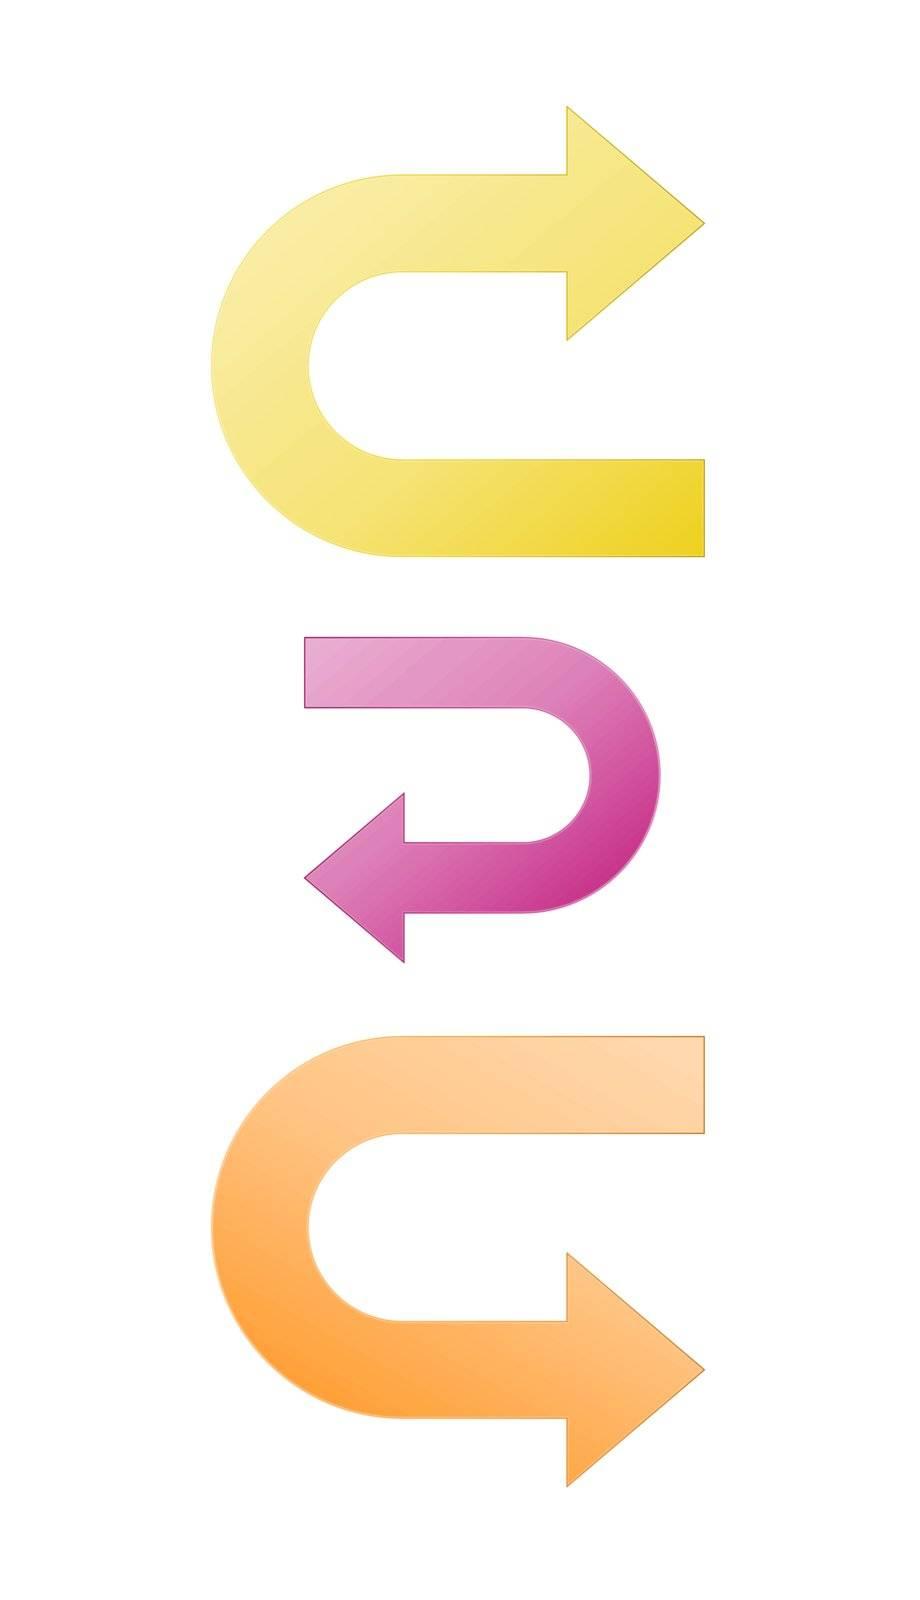 Set of yellow, purple and orange turn graphic element